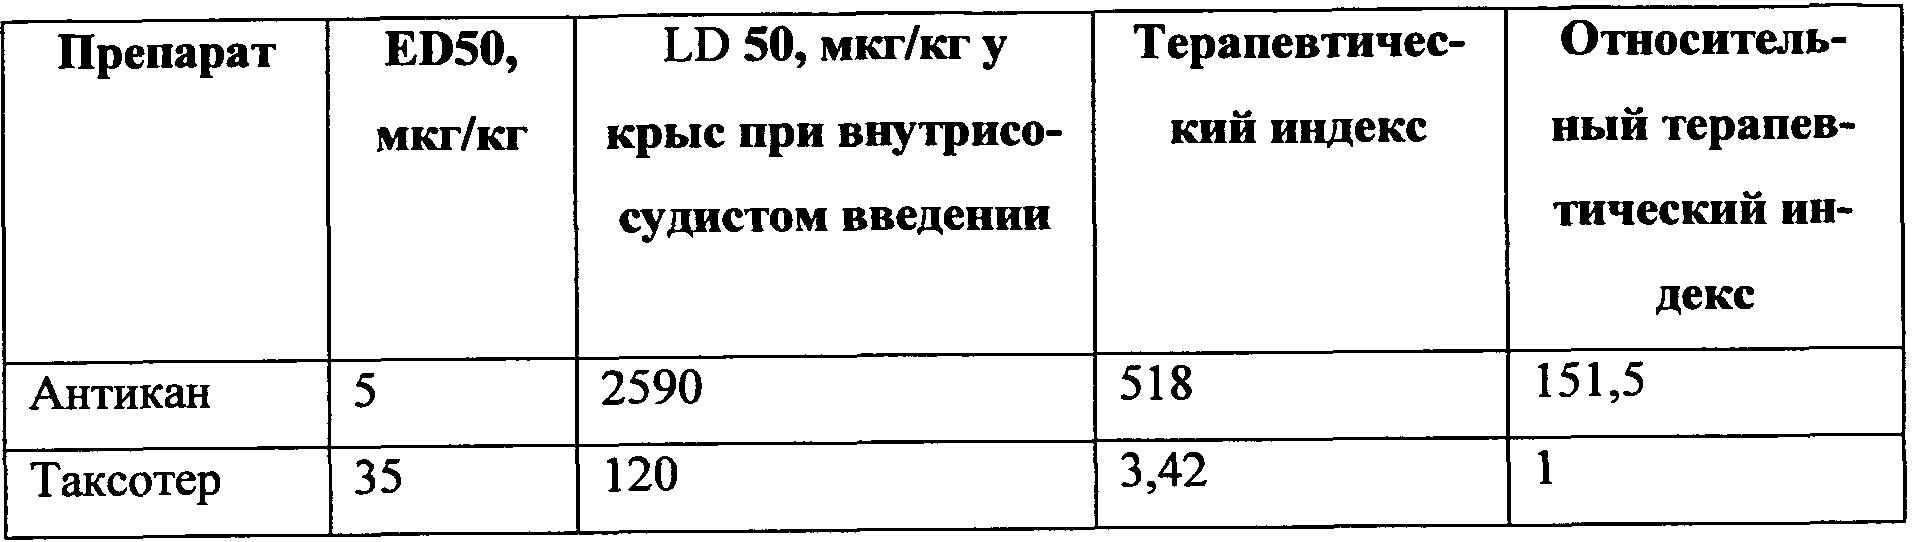 Индекс Терапевтический фото